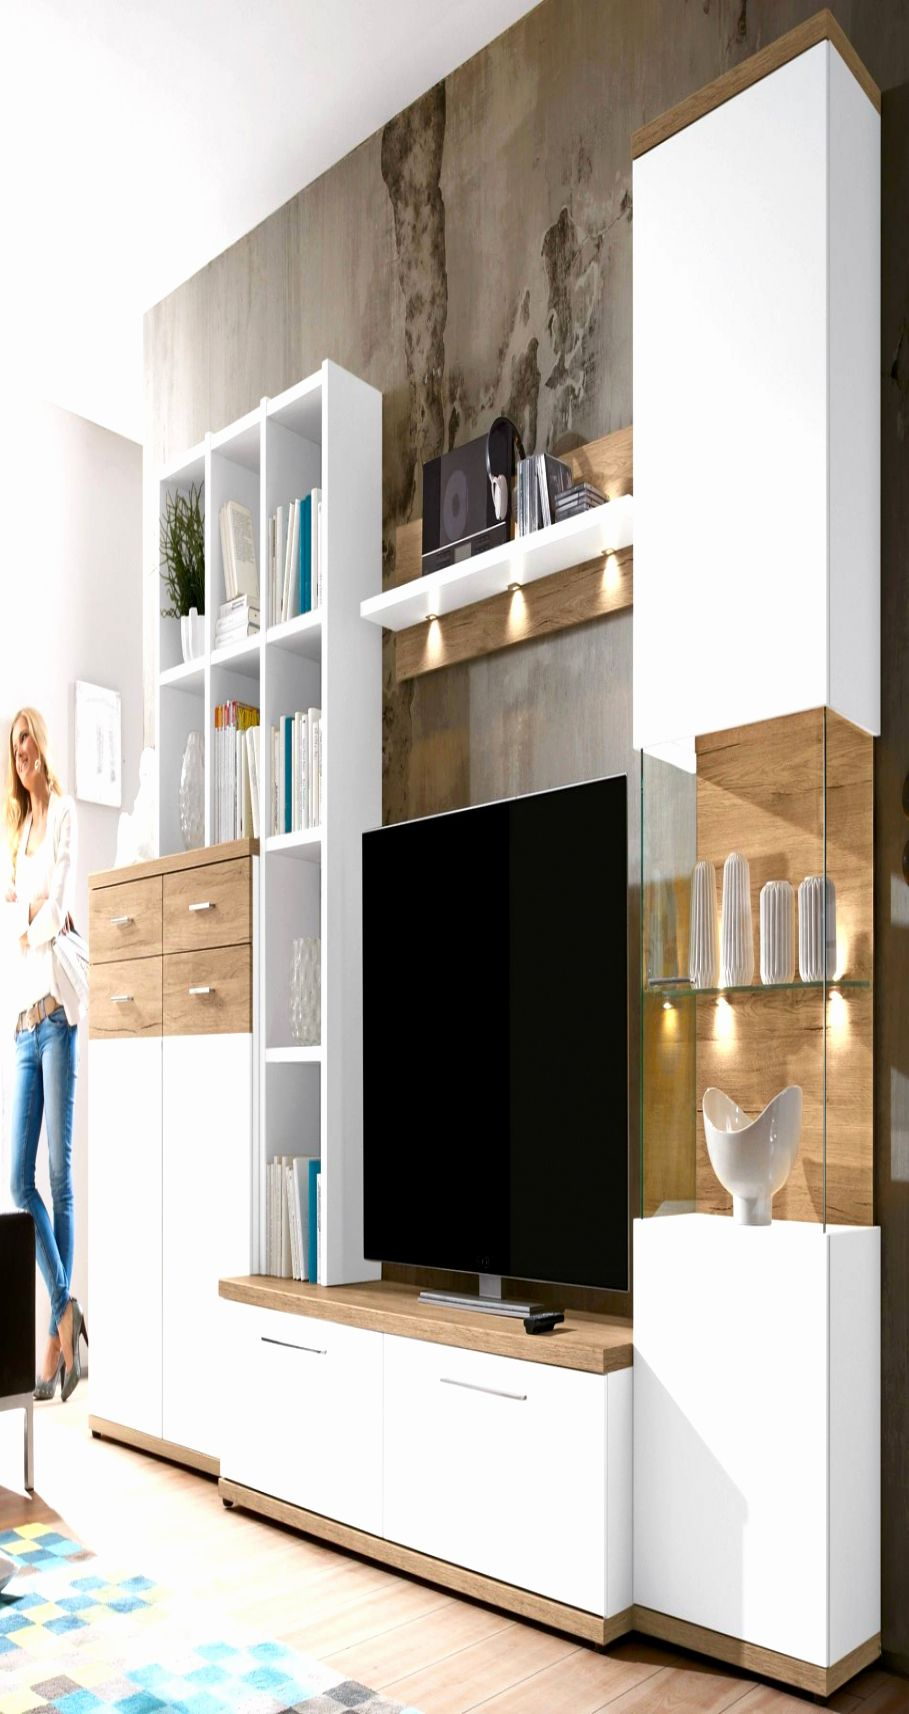 10 Inspirierend Ikea Wohnzimmer Ideen in 10  Small living rooms